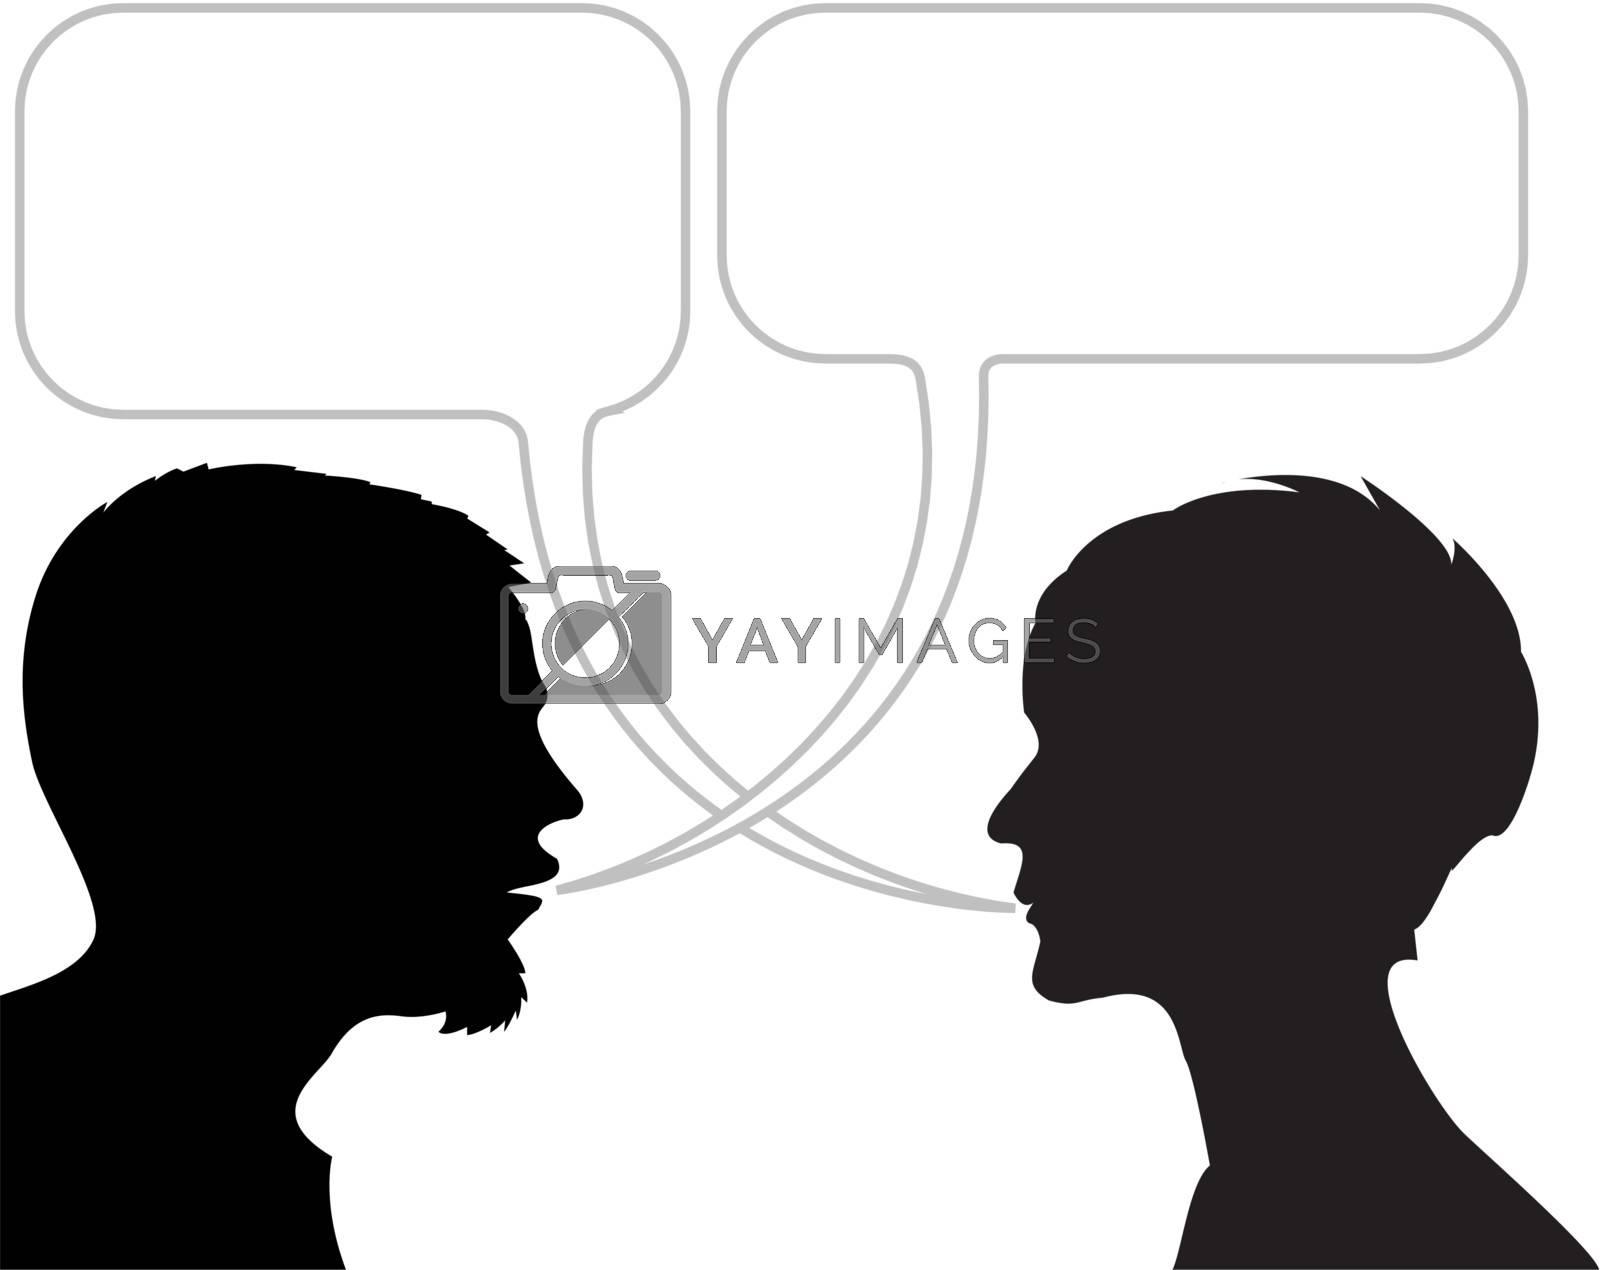 Dialogue Comic Strip Royalty Free Stock Image